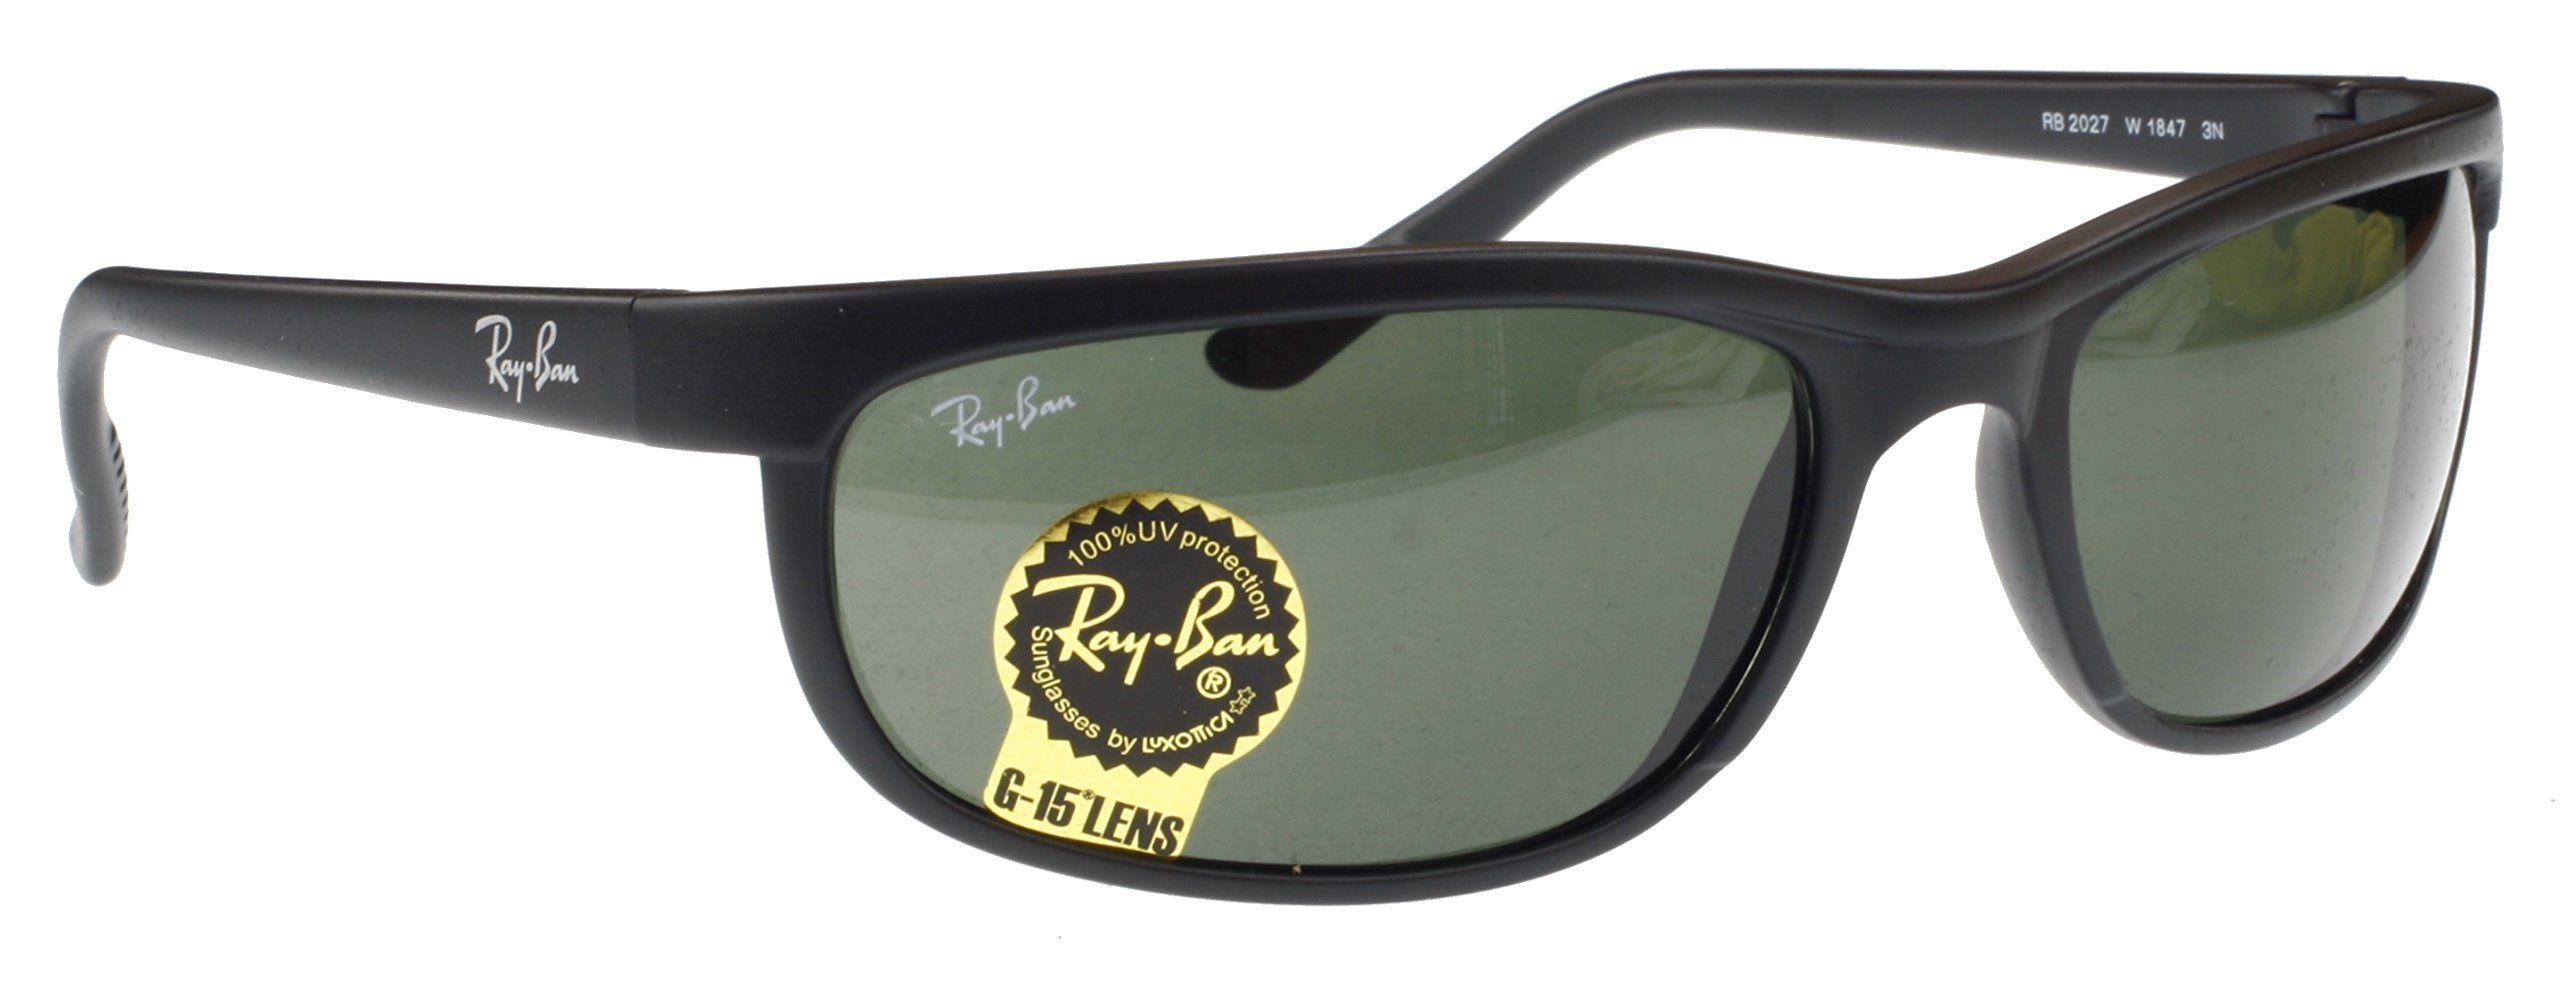 3779bcf960 Ray-Ban Icons Predator 2 Sunglasses